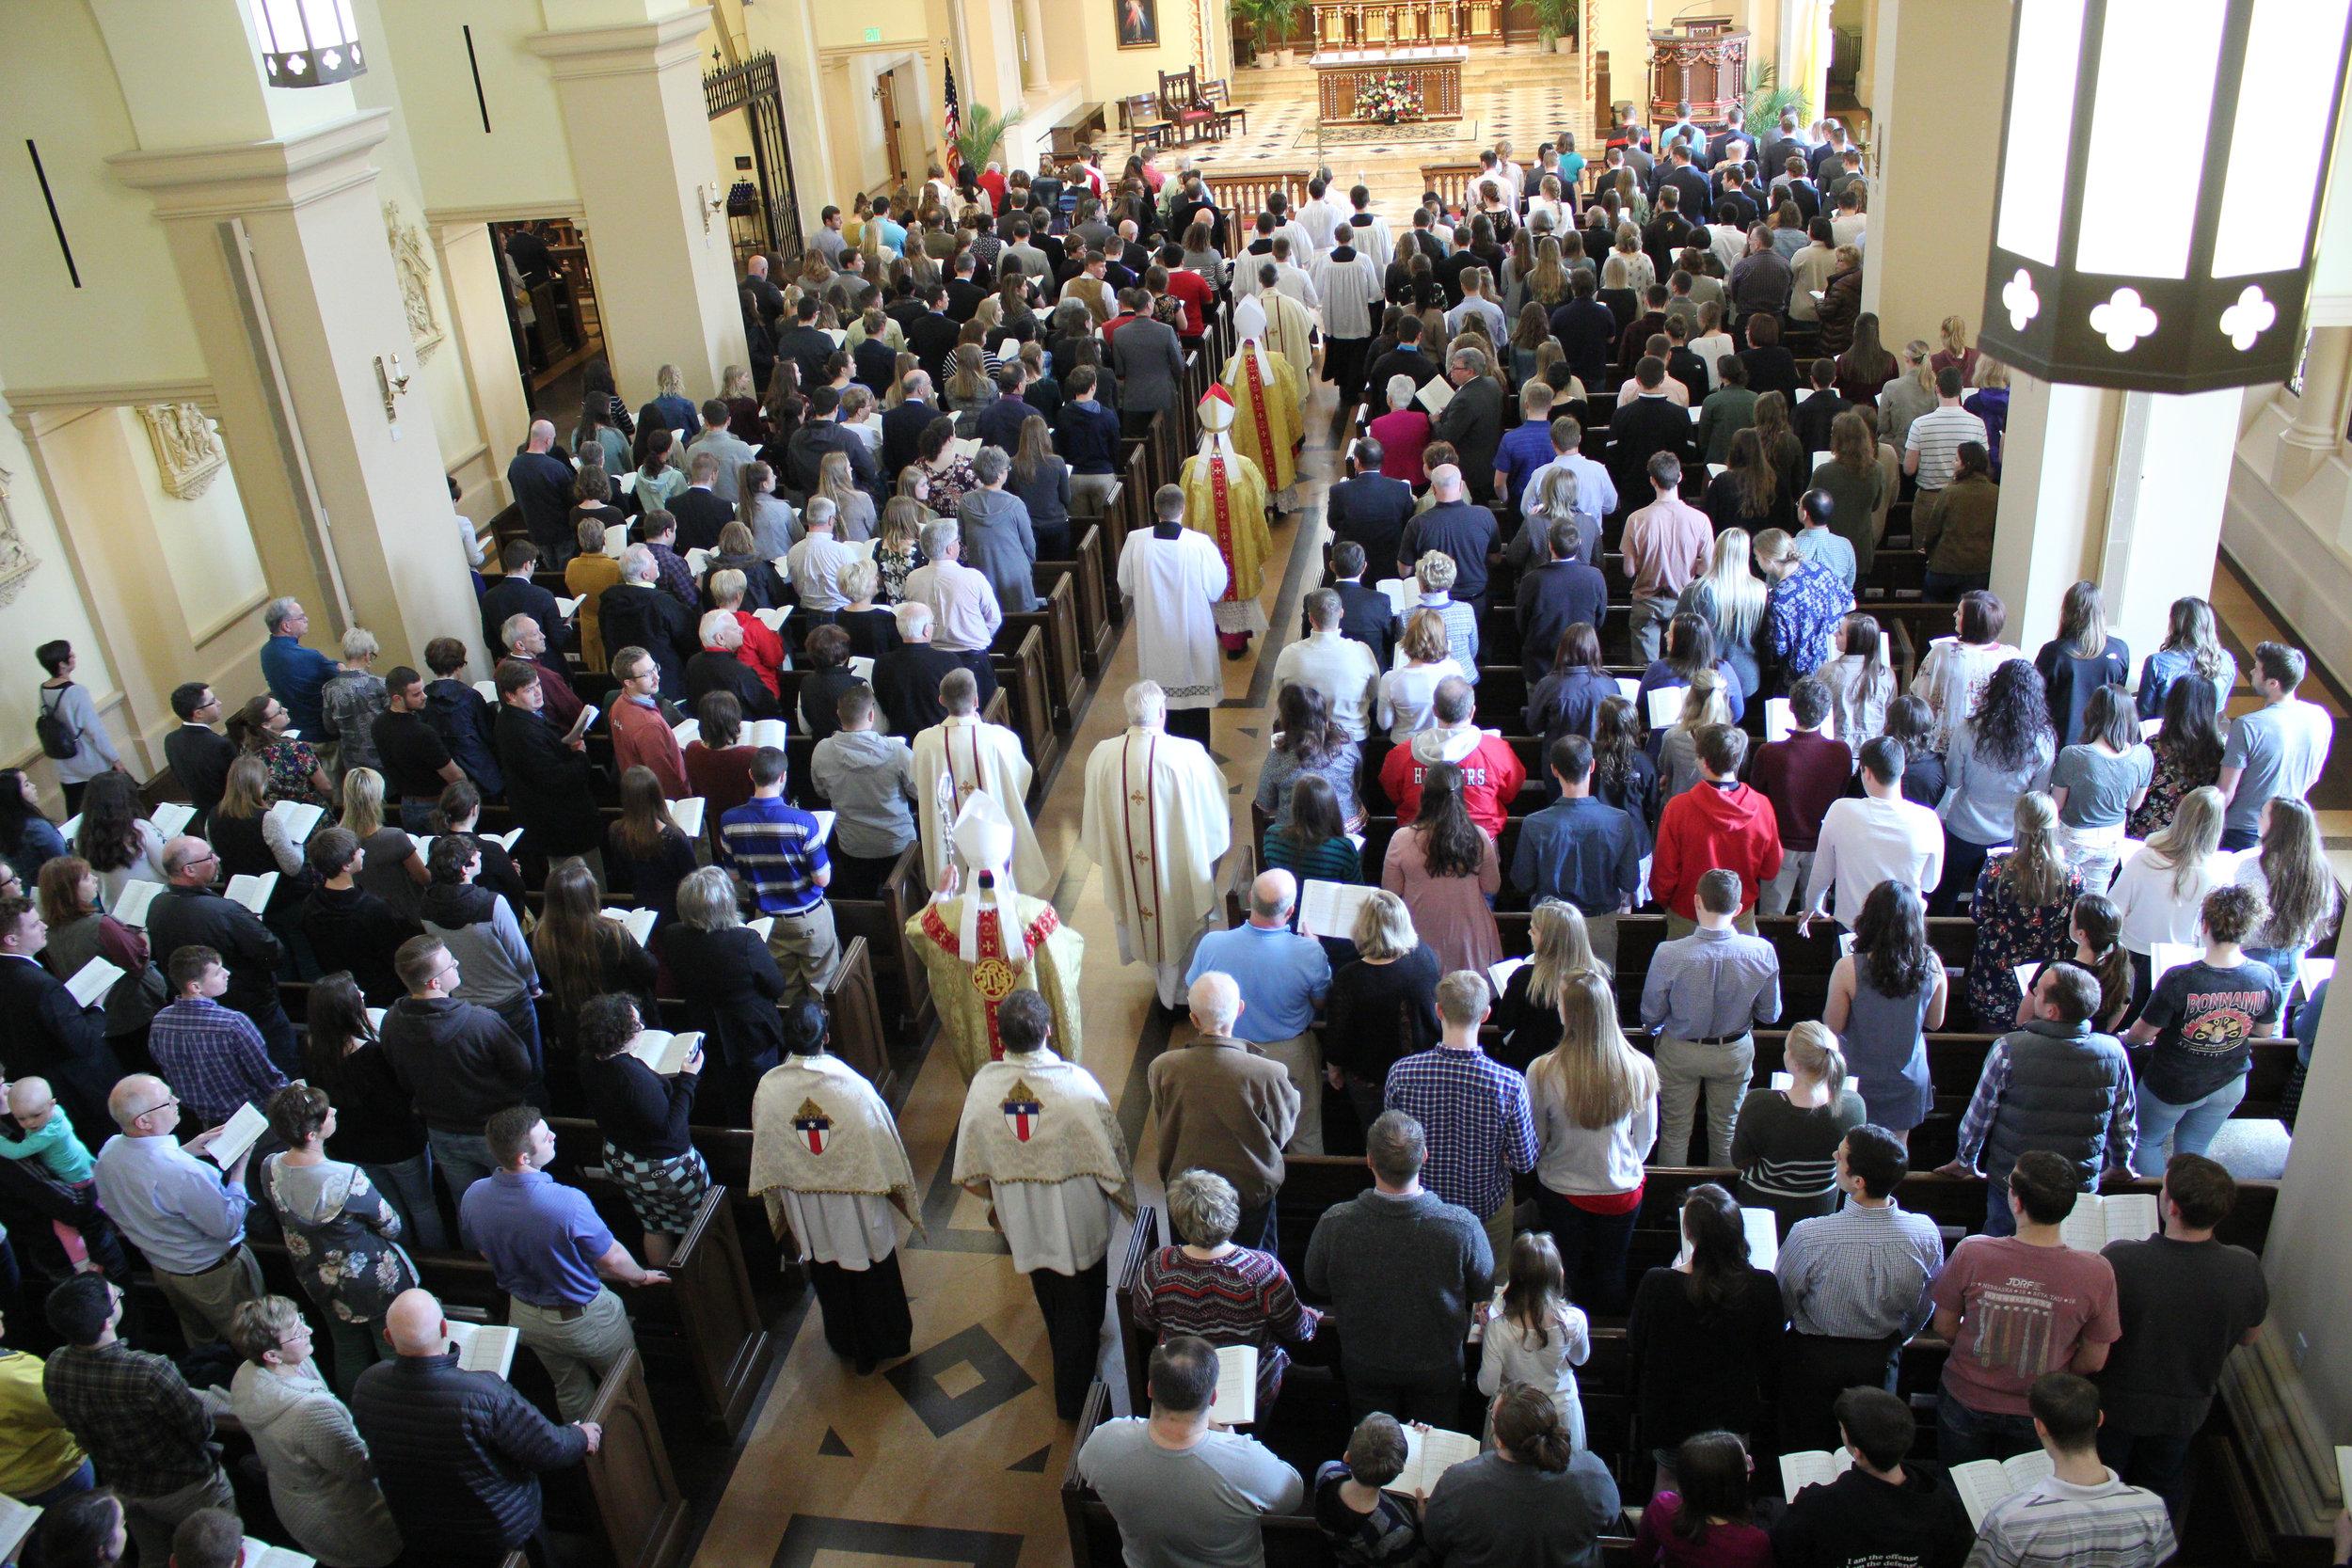 2018-04-22 Apostolic Nuncio Visits Newman-001.jpg